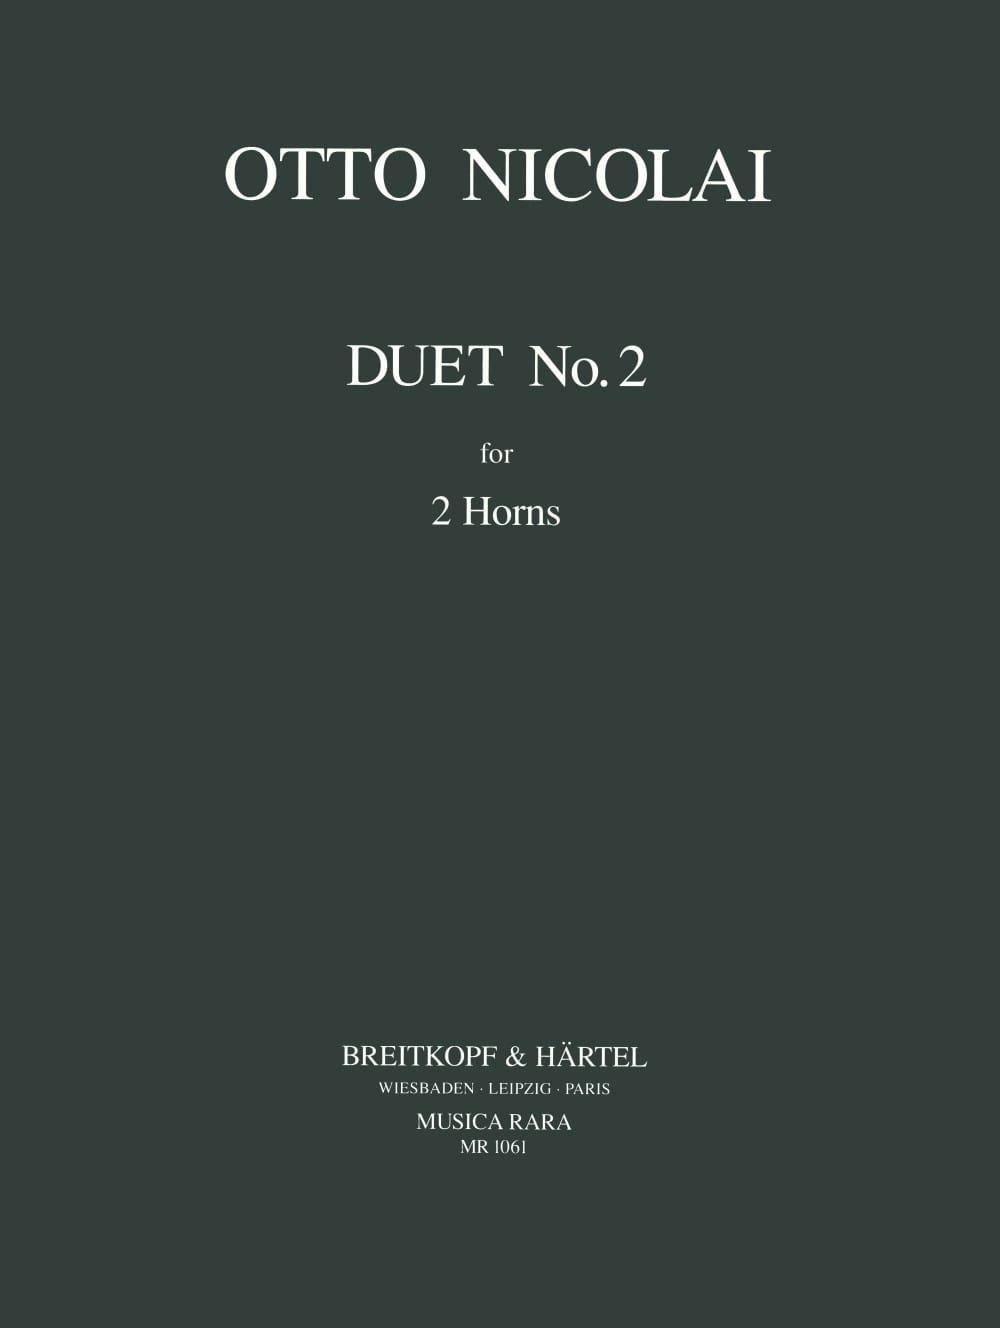 Duet N° 2 - Otto Nicolai - Partition - Cor - laflutedepan.com